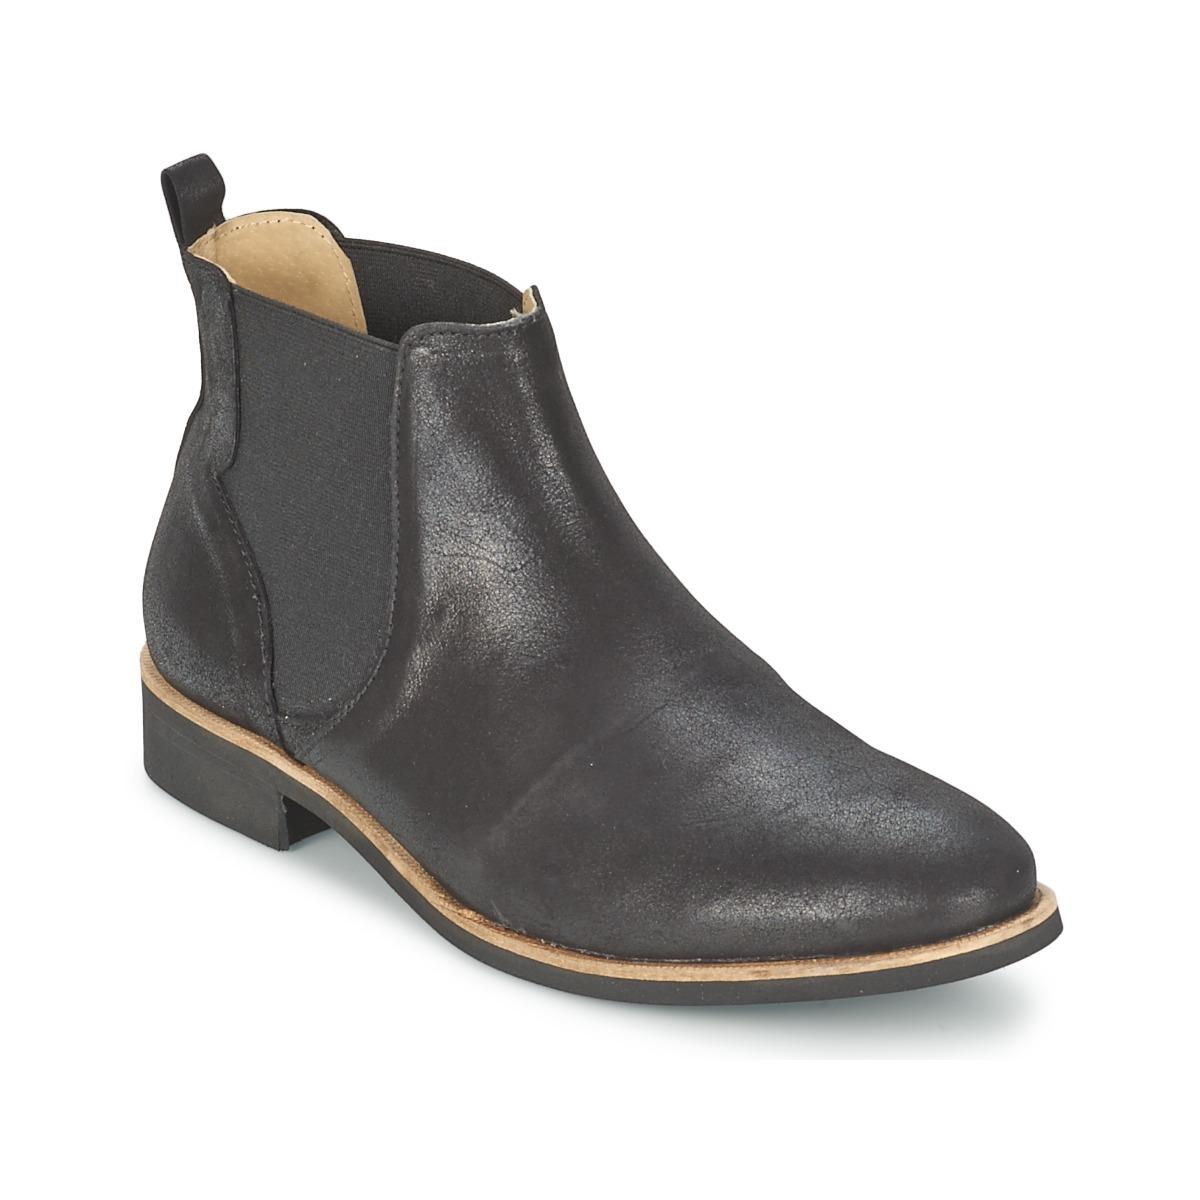 Petite Mendigote LONDRES Schwarz - Kostenloser Versand bei Spartoode ! - Schuhe Boots Damen 97,50 €